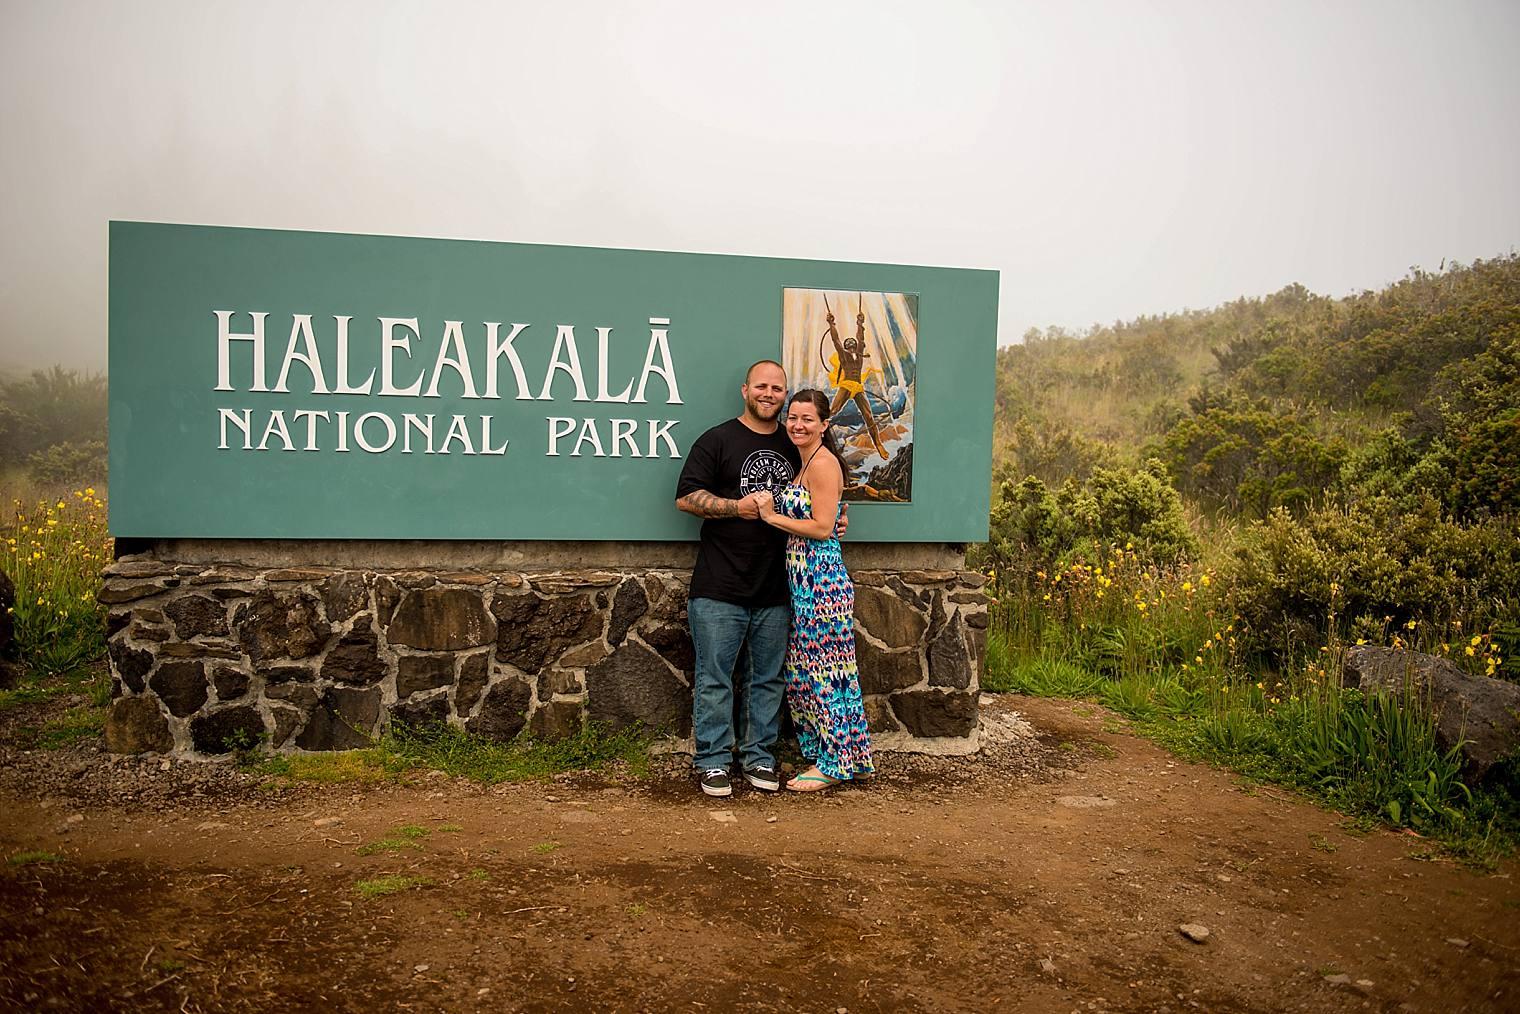 haleakala national park sign